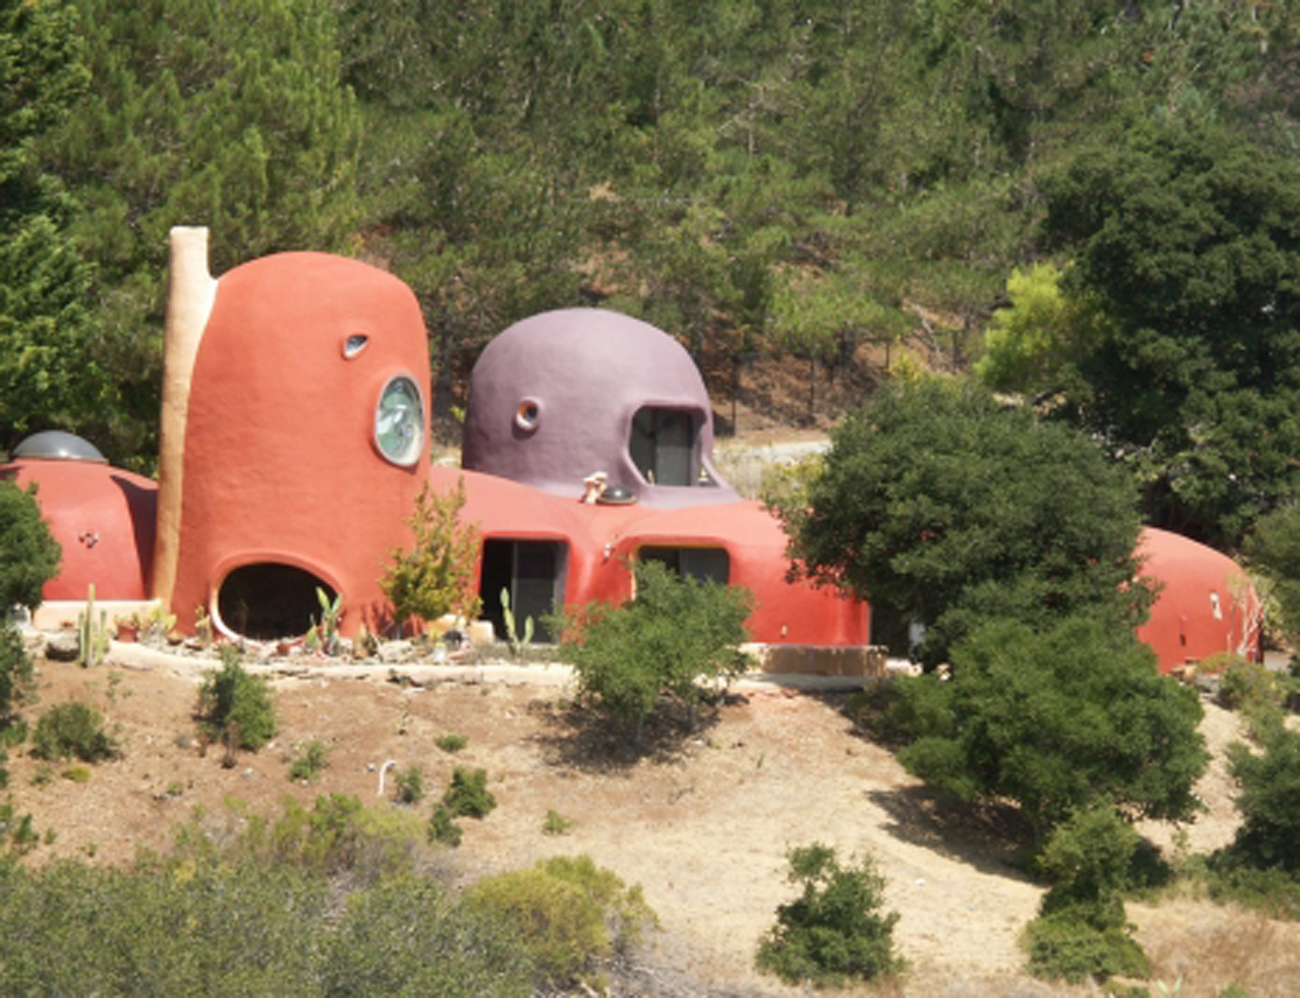 La casa dei Flintstones esiste ed è stata venduta per 1.4 milioni